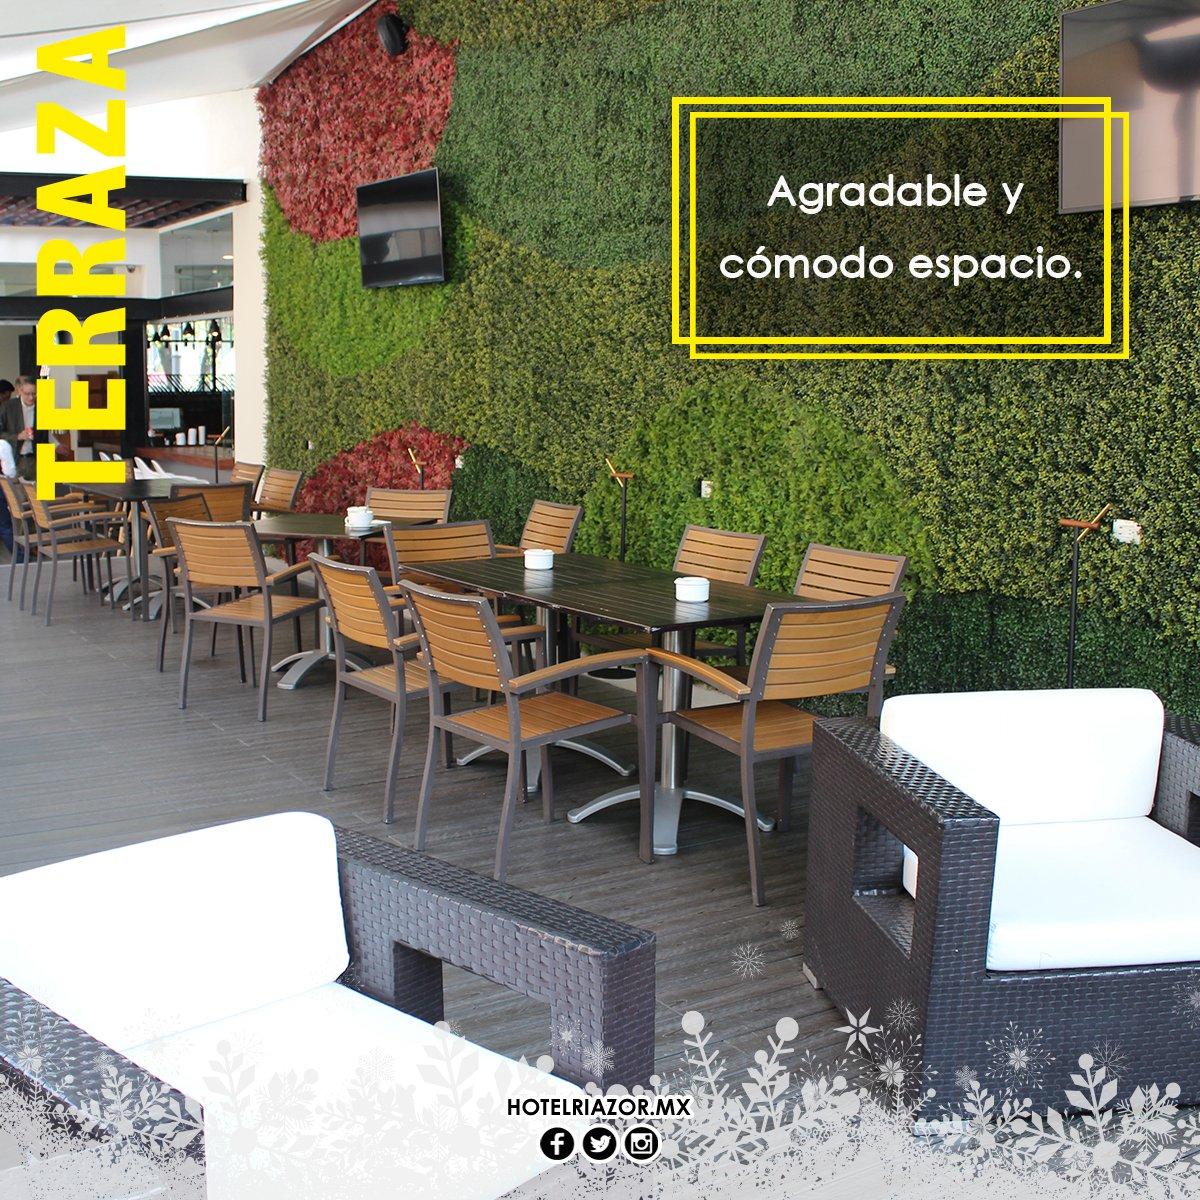 Hotel Riazor On Twitter En Nuestra Terraza Podrás